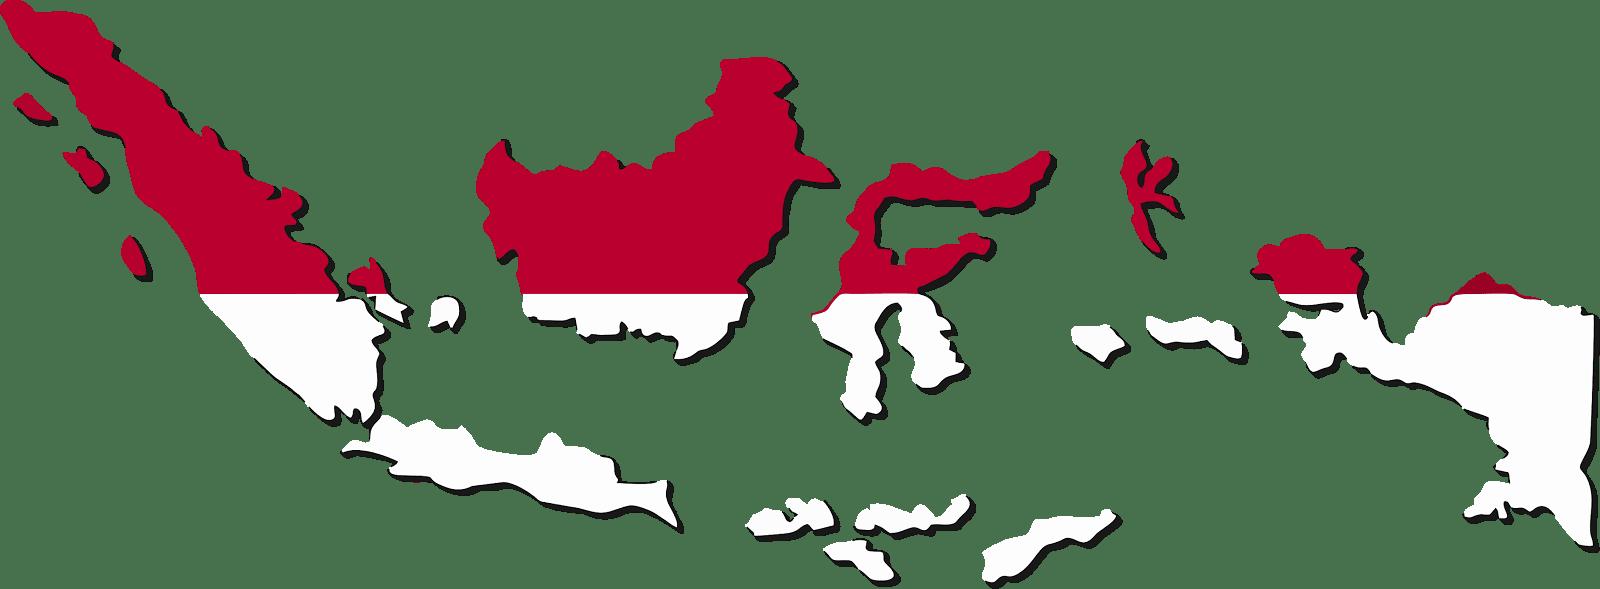 50 Materi Contoh Soal Cpns 2020 Tes Wawasan Kebangsaan Undang Undang Dasar 1945 Contoh Surat Peta Gambar Bendera